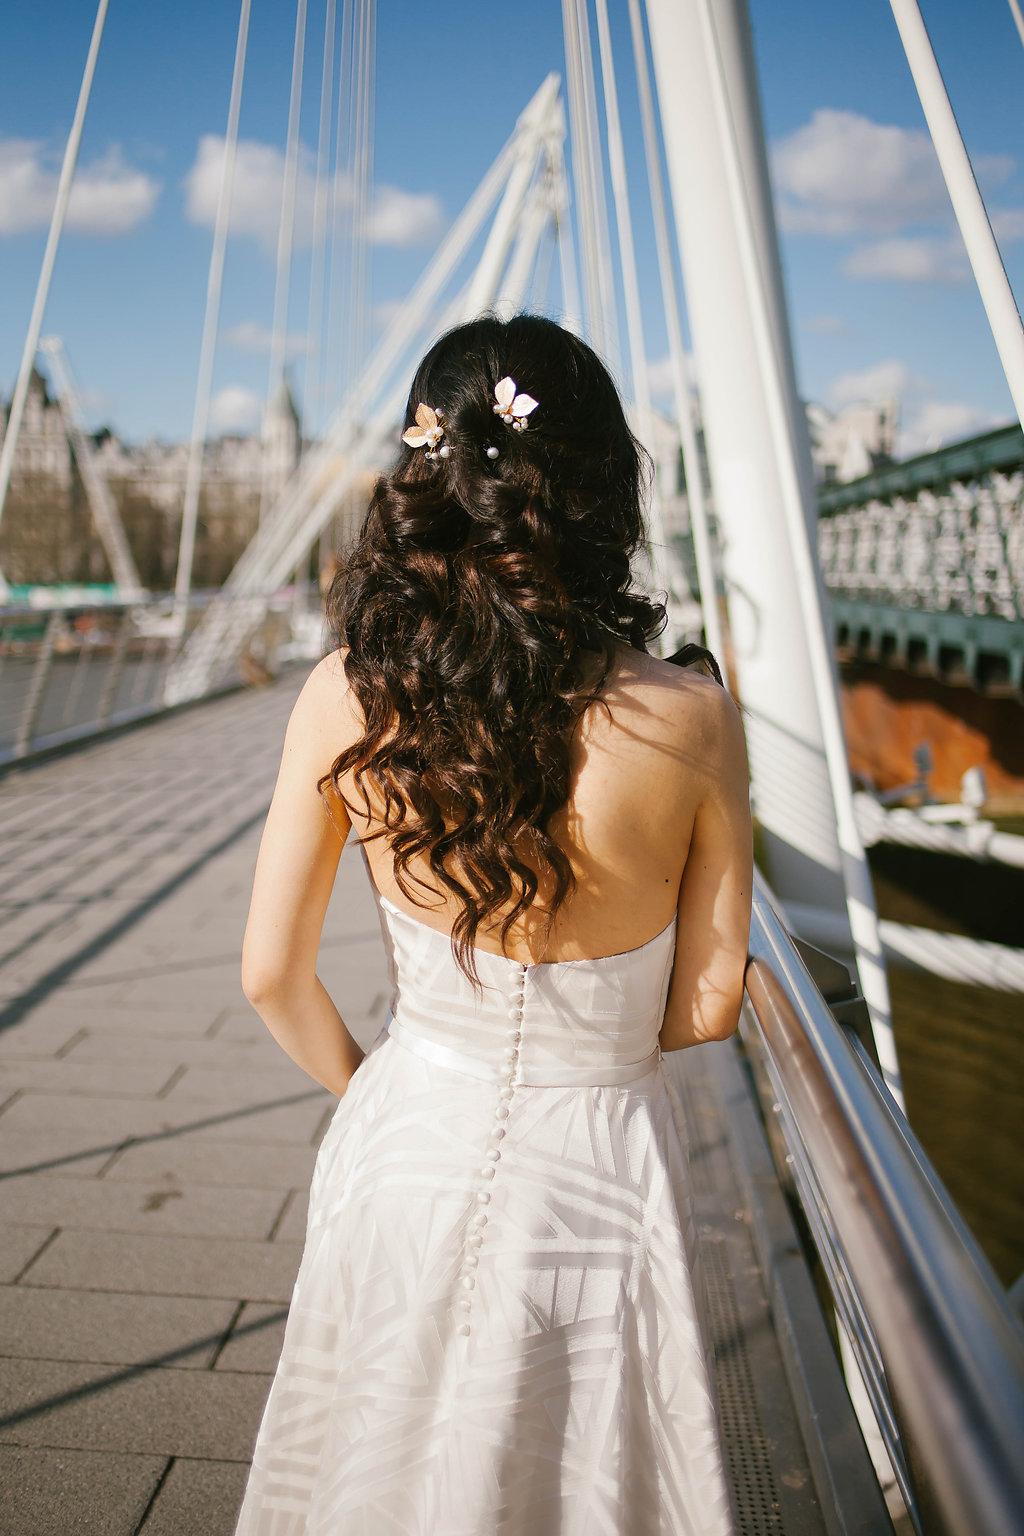 Nina Pang Photography - City Bride - London wedding - City wedding - Chinese wedding 15 (2)